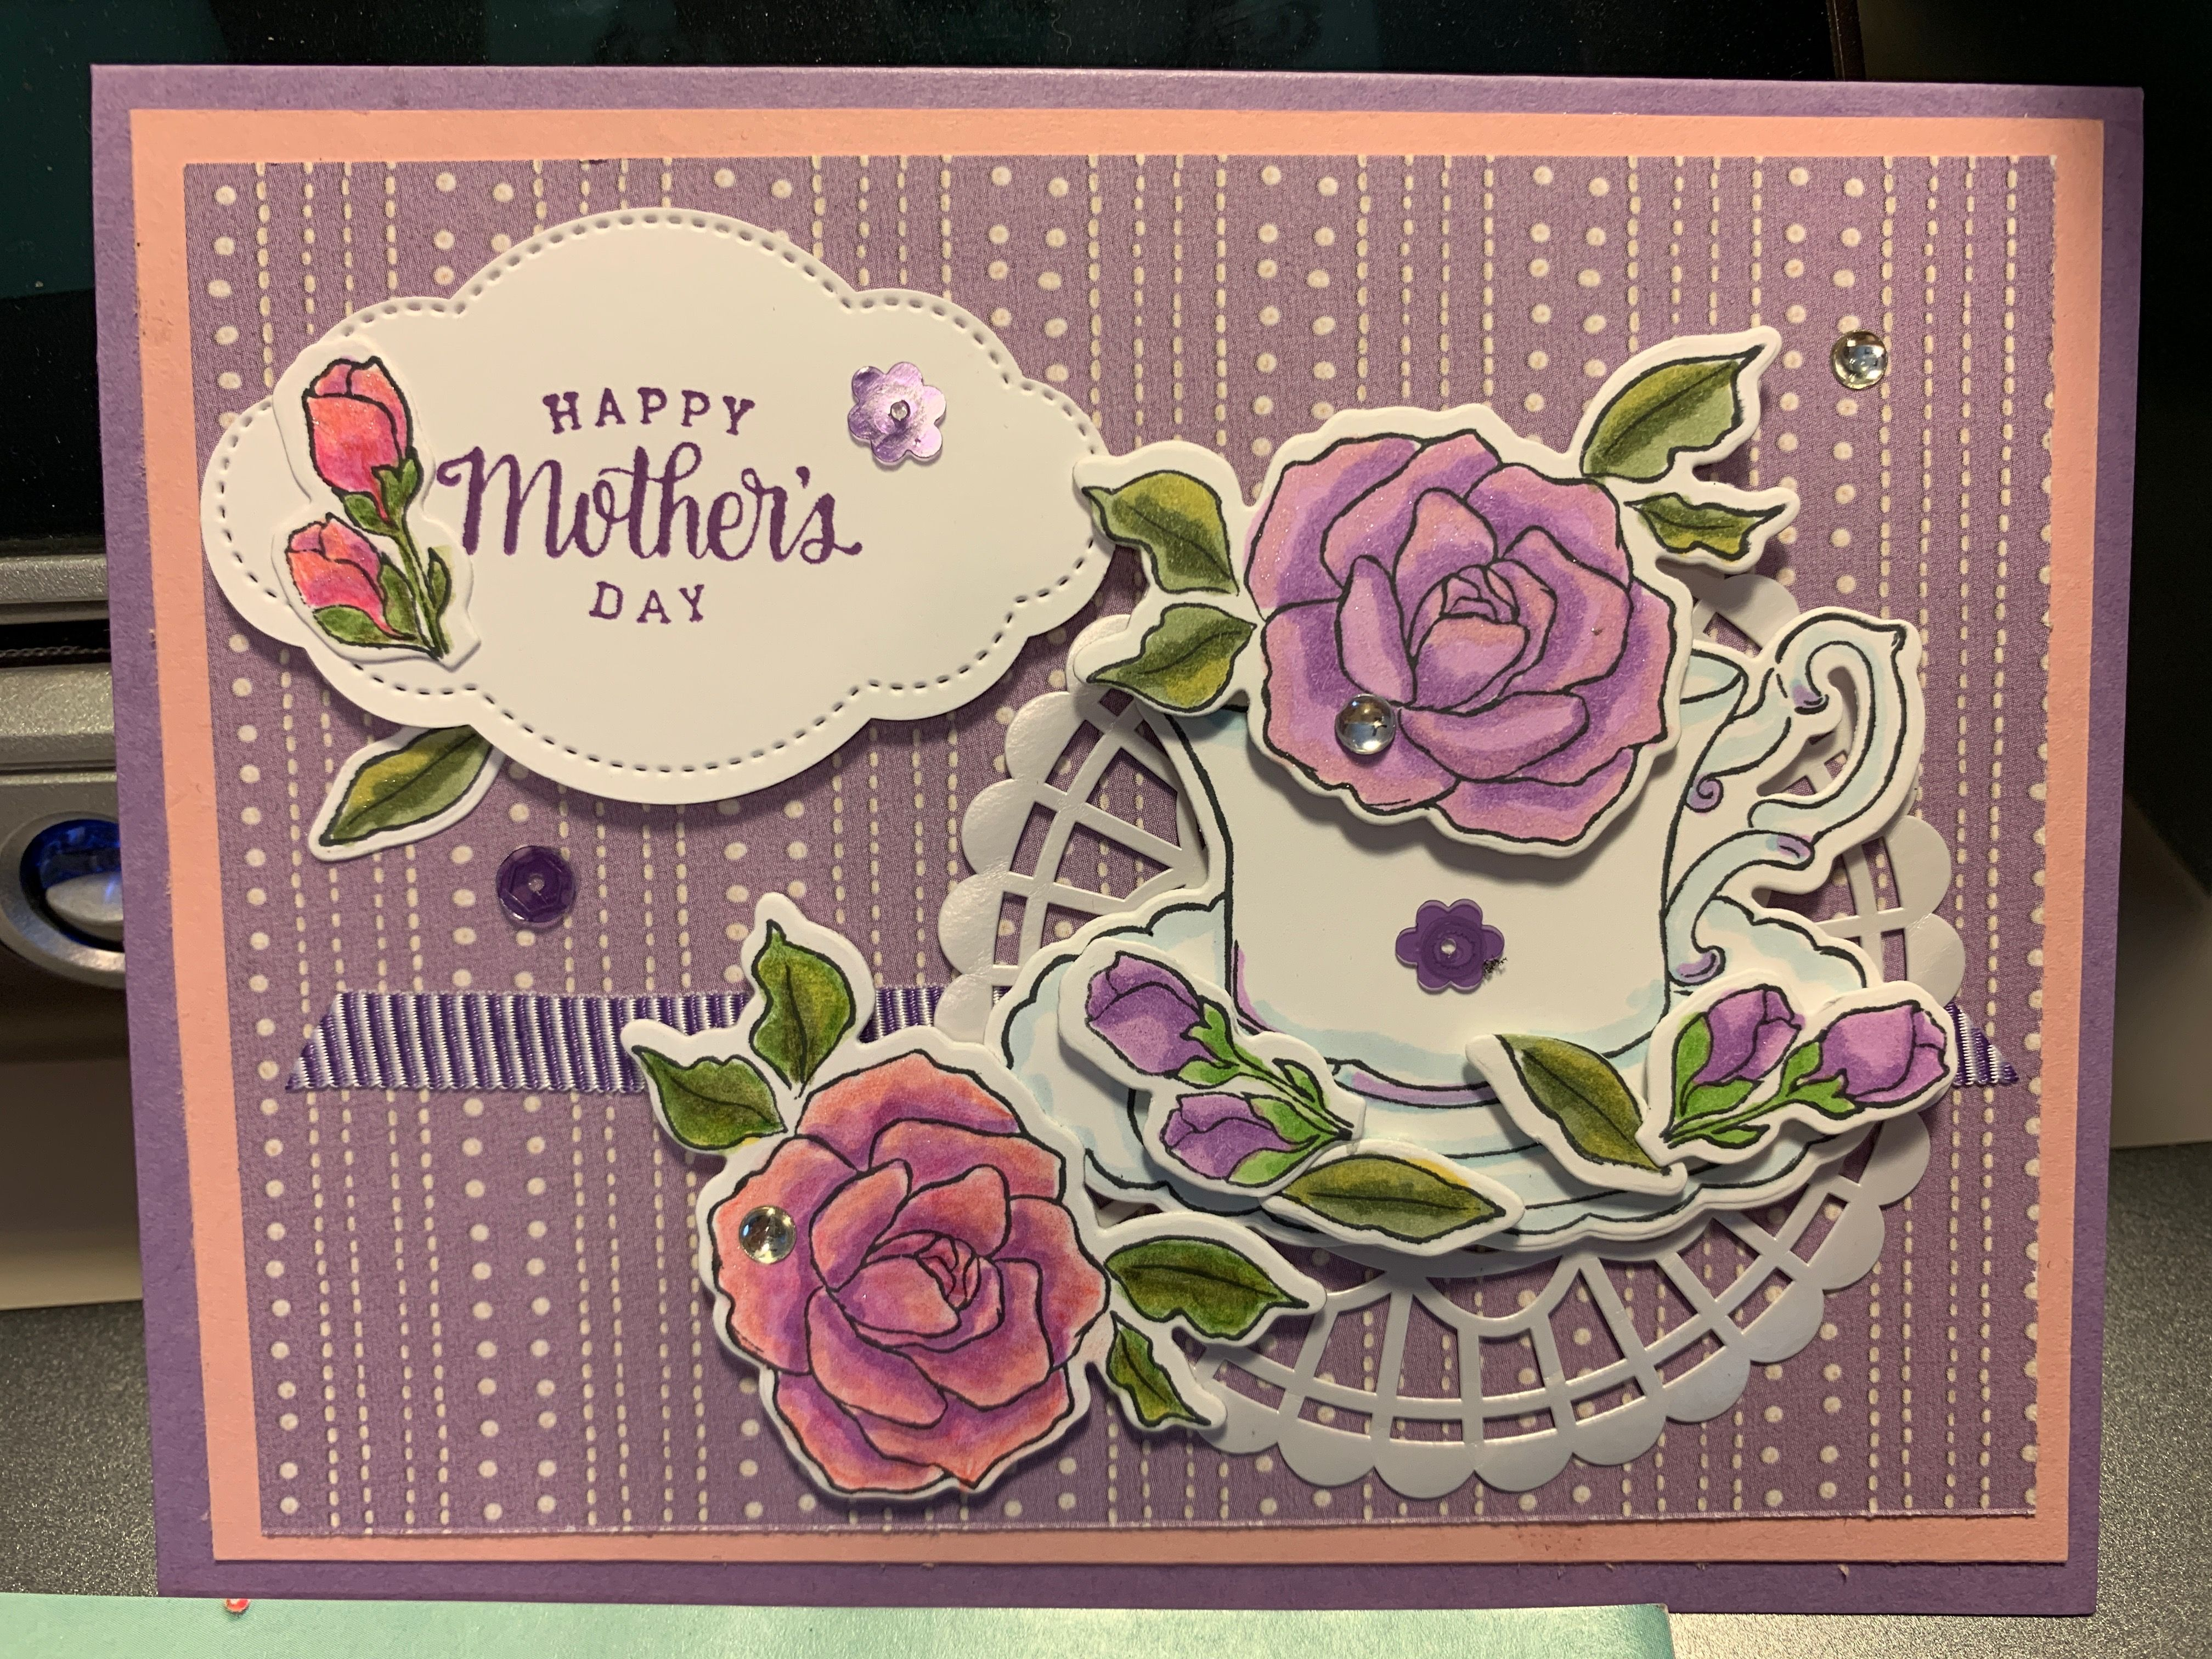 Pin by Linda Hobart on Linda's Stampin' Up! Cards and ...